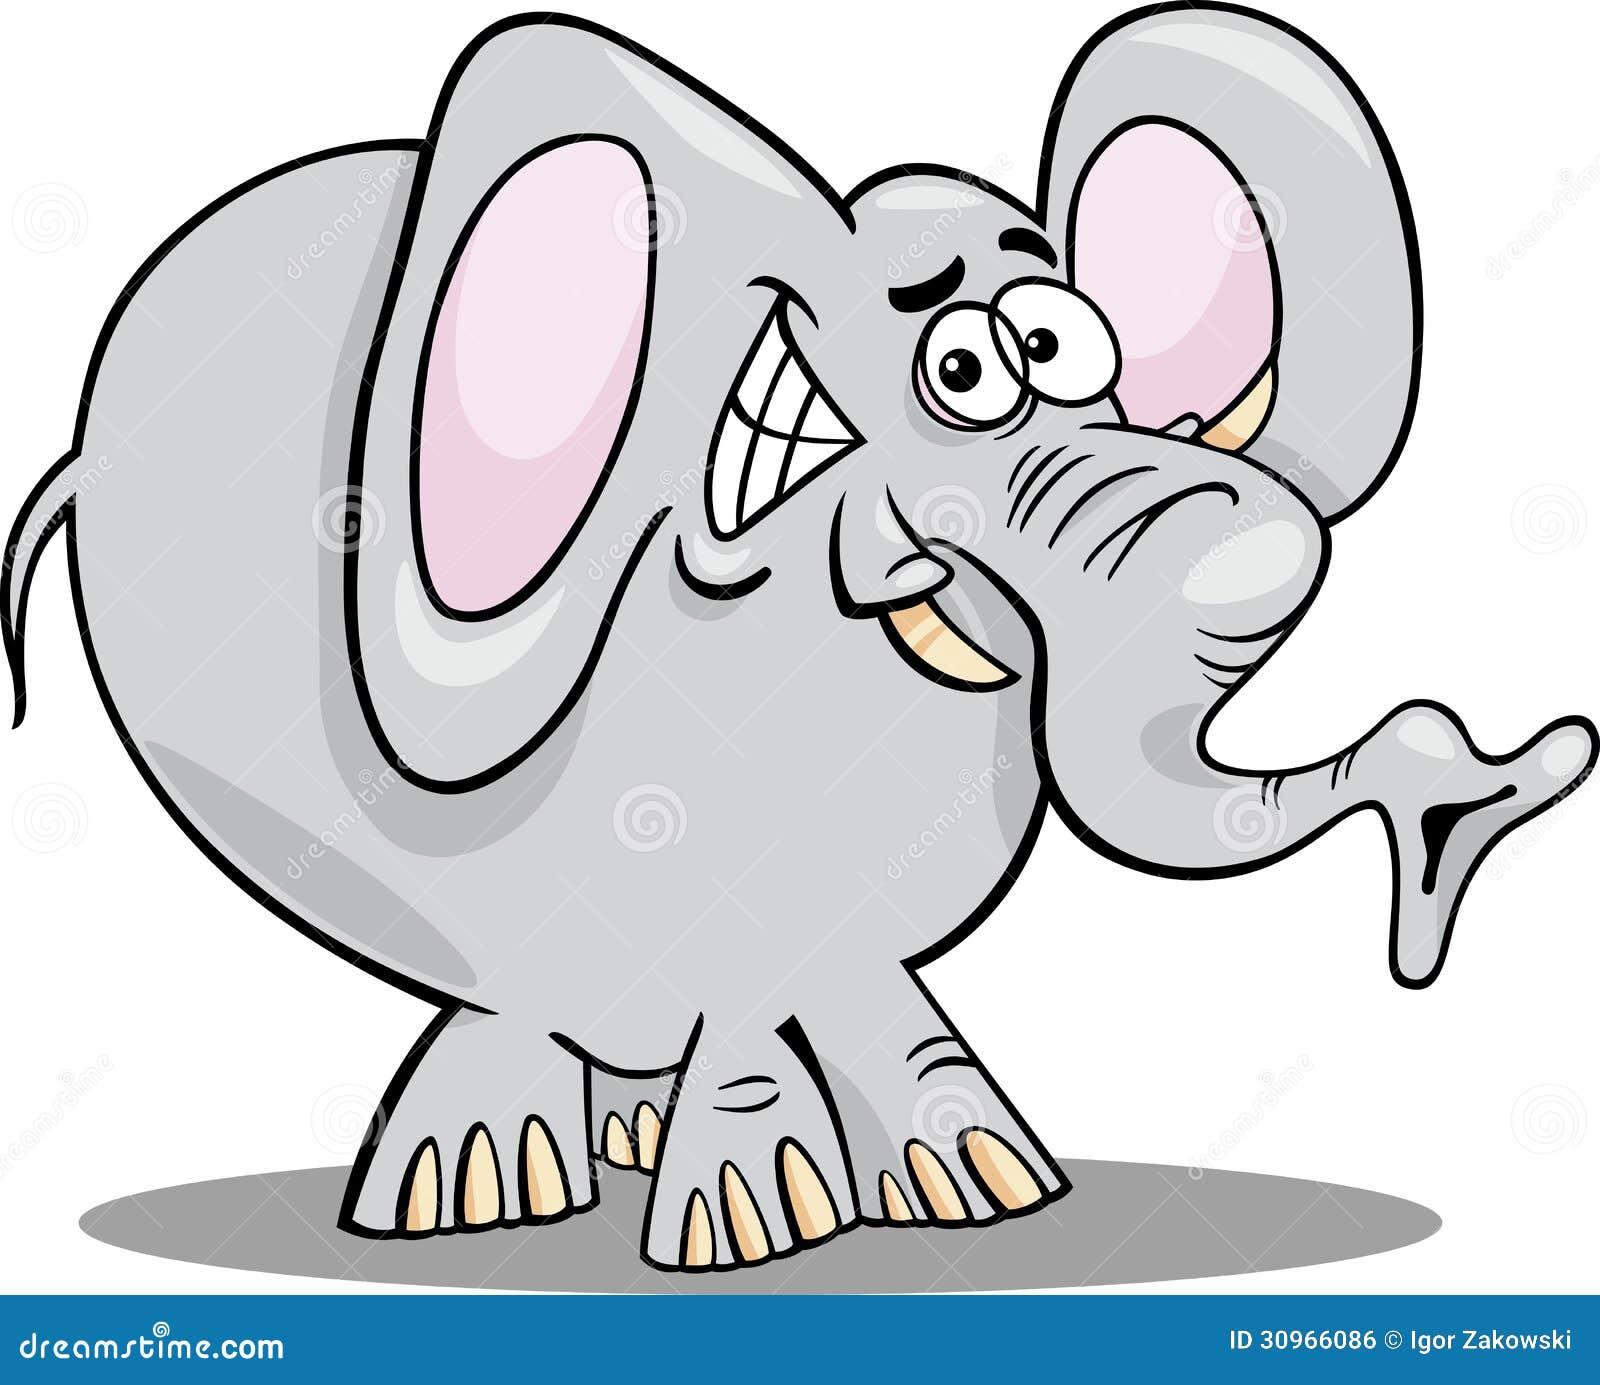 Cartoon Illustration Of Elephant Stock Vector ...